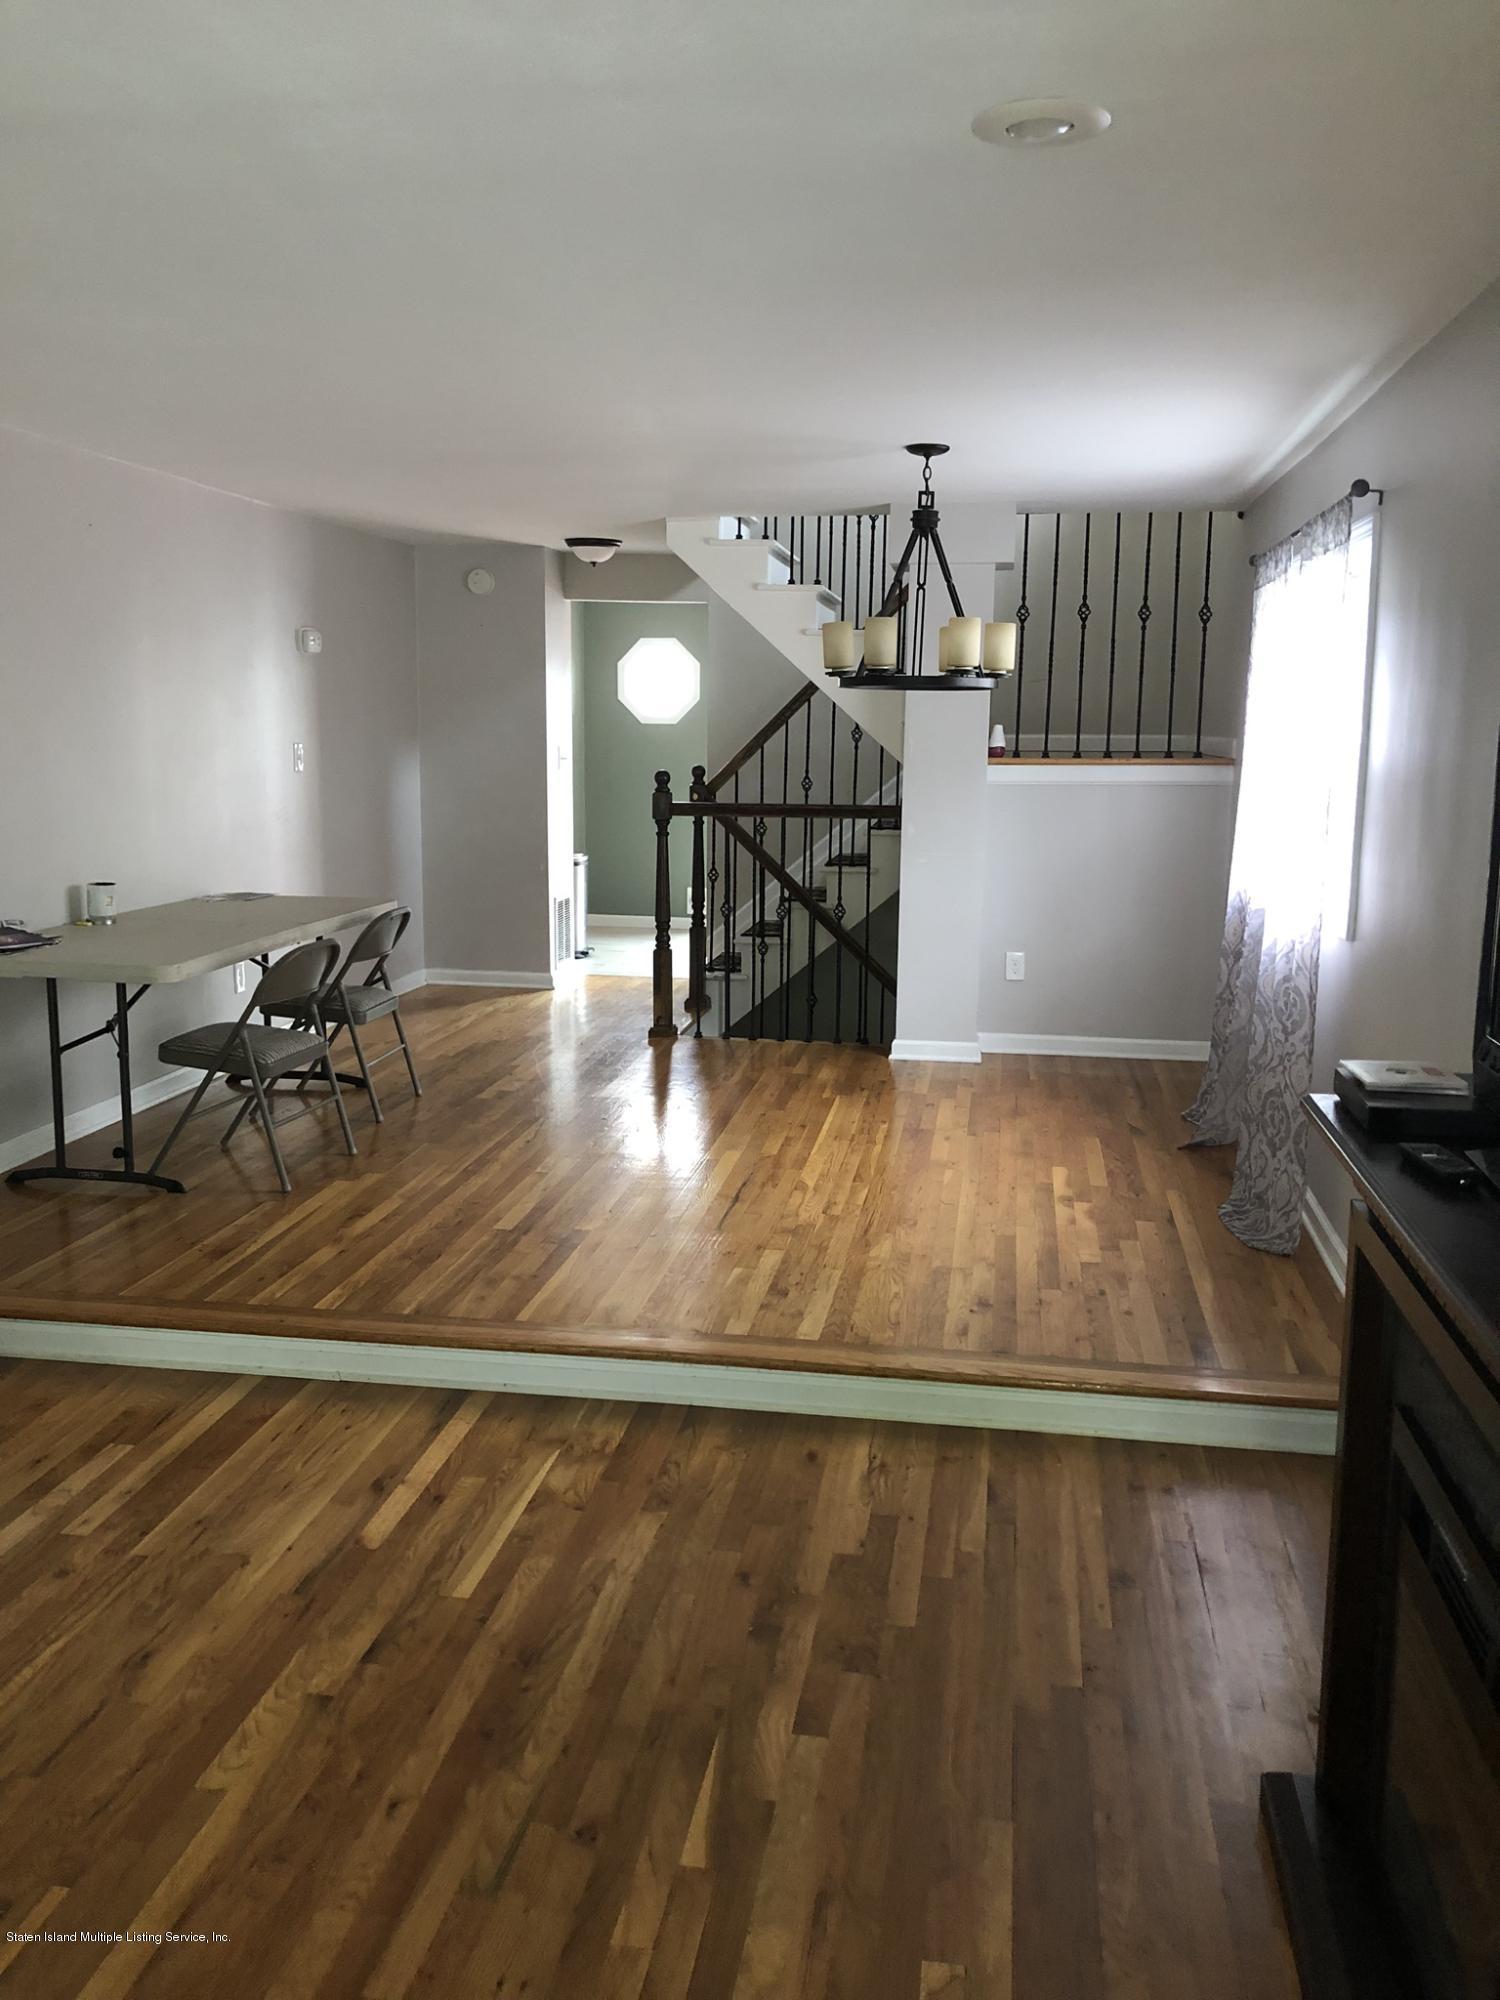 Single Family - Semi-Attached 59 Cranford Street  Staten Island, NY 10308, MLS-1128460-3